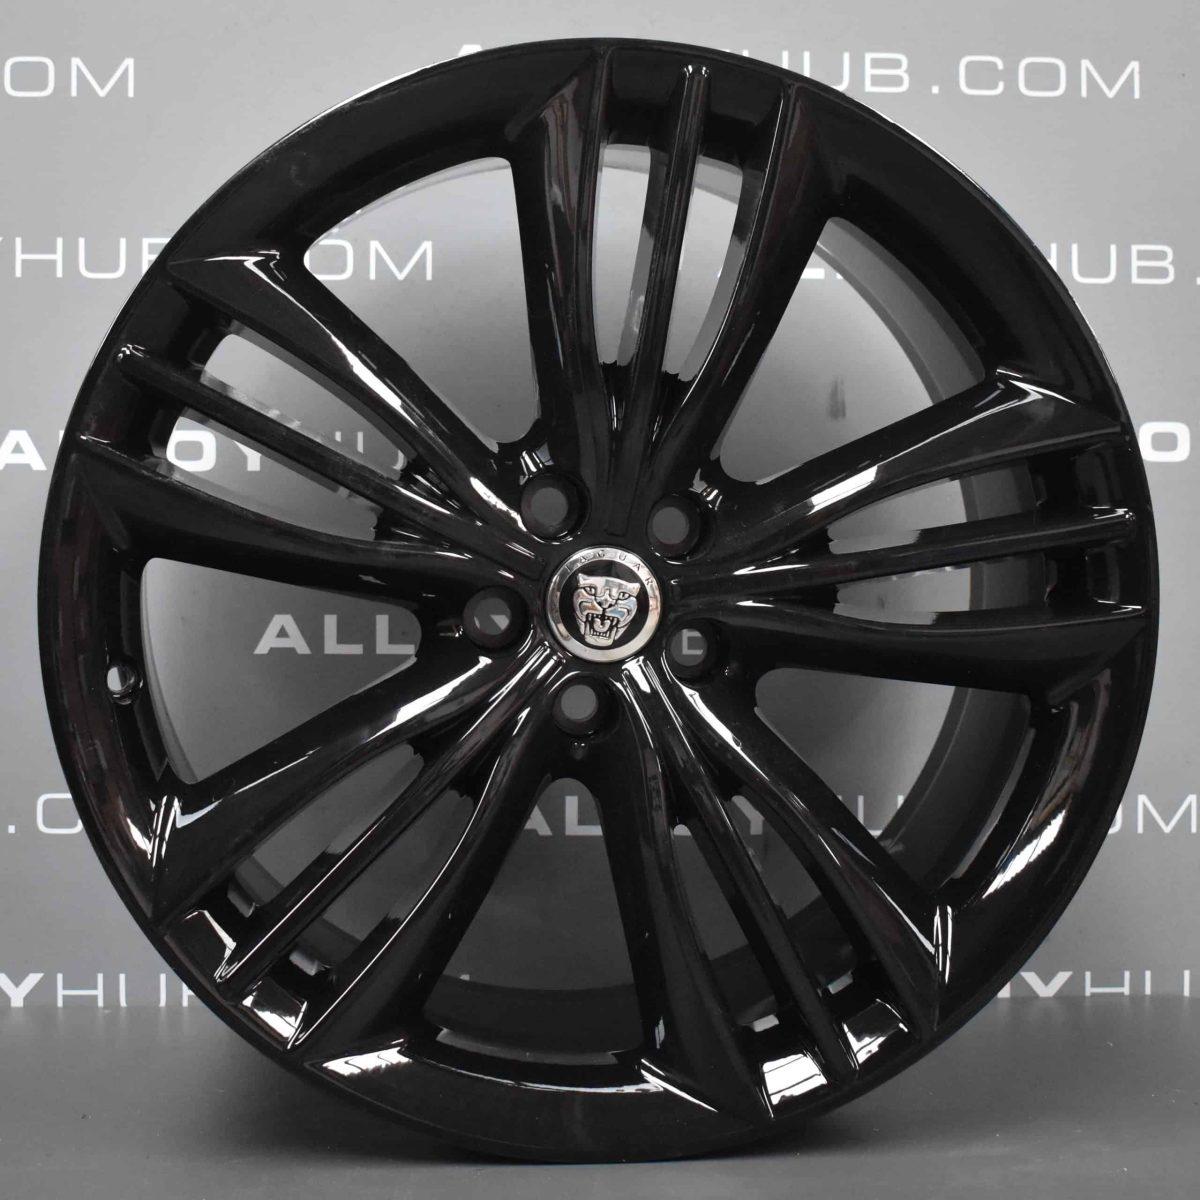 "Genuine Jaguar XJ X351 Mataiva 5 Split-Spoke 20"" Inch Alloy Wheels with Gloss Black Finish AW9M-1007-AA AW9M-1007-BA"